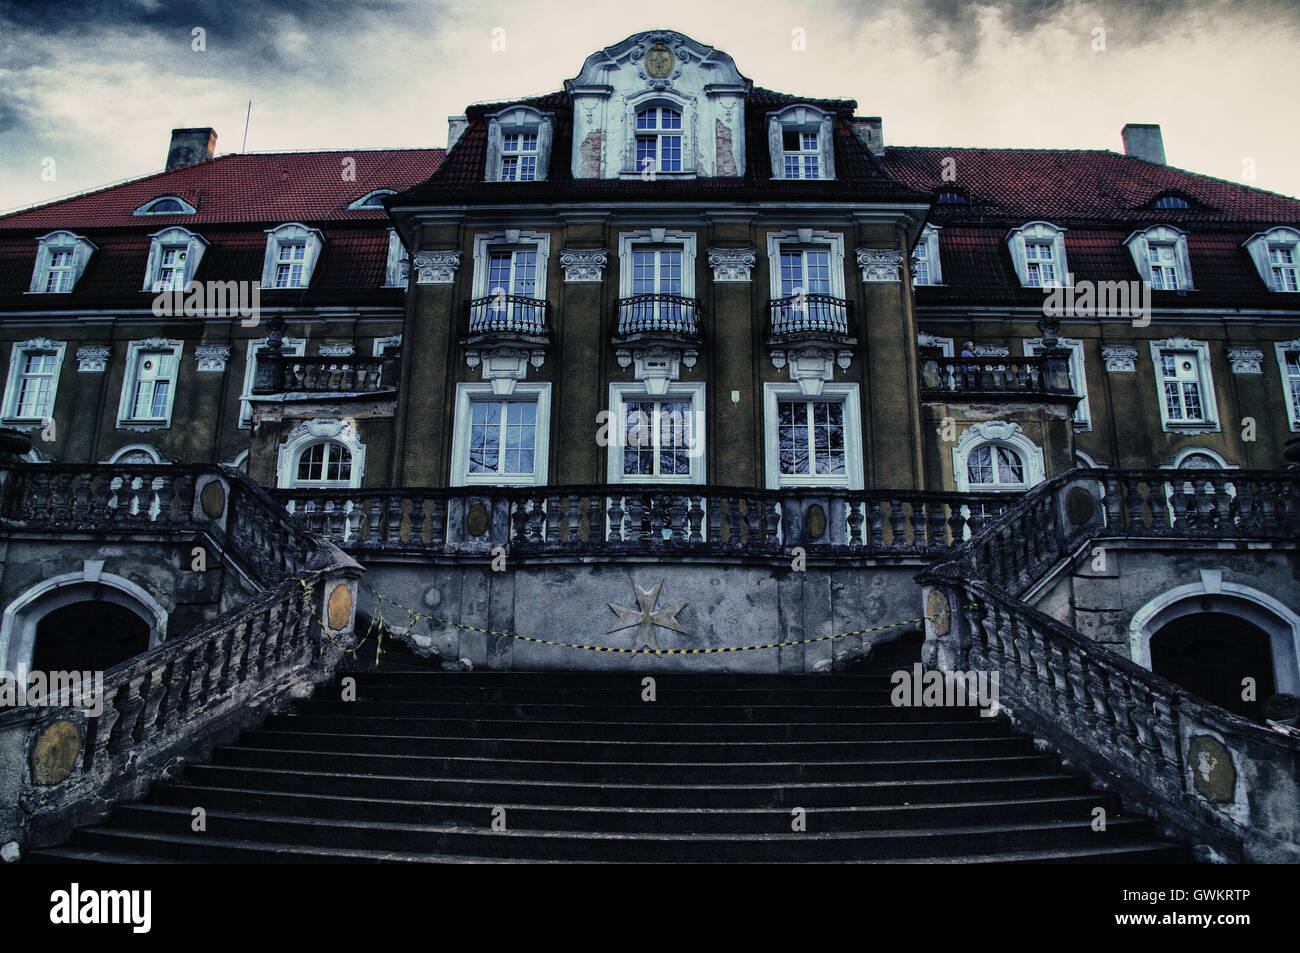 building, Europe, house, neo-renaissance, place, Poland, renaissance, resort, revival, sanatorium, spa, old, dark, - Stock Image